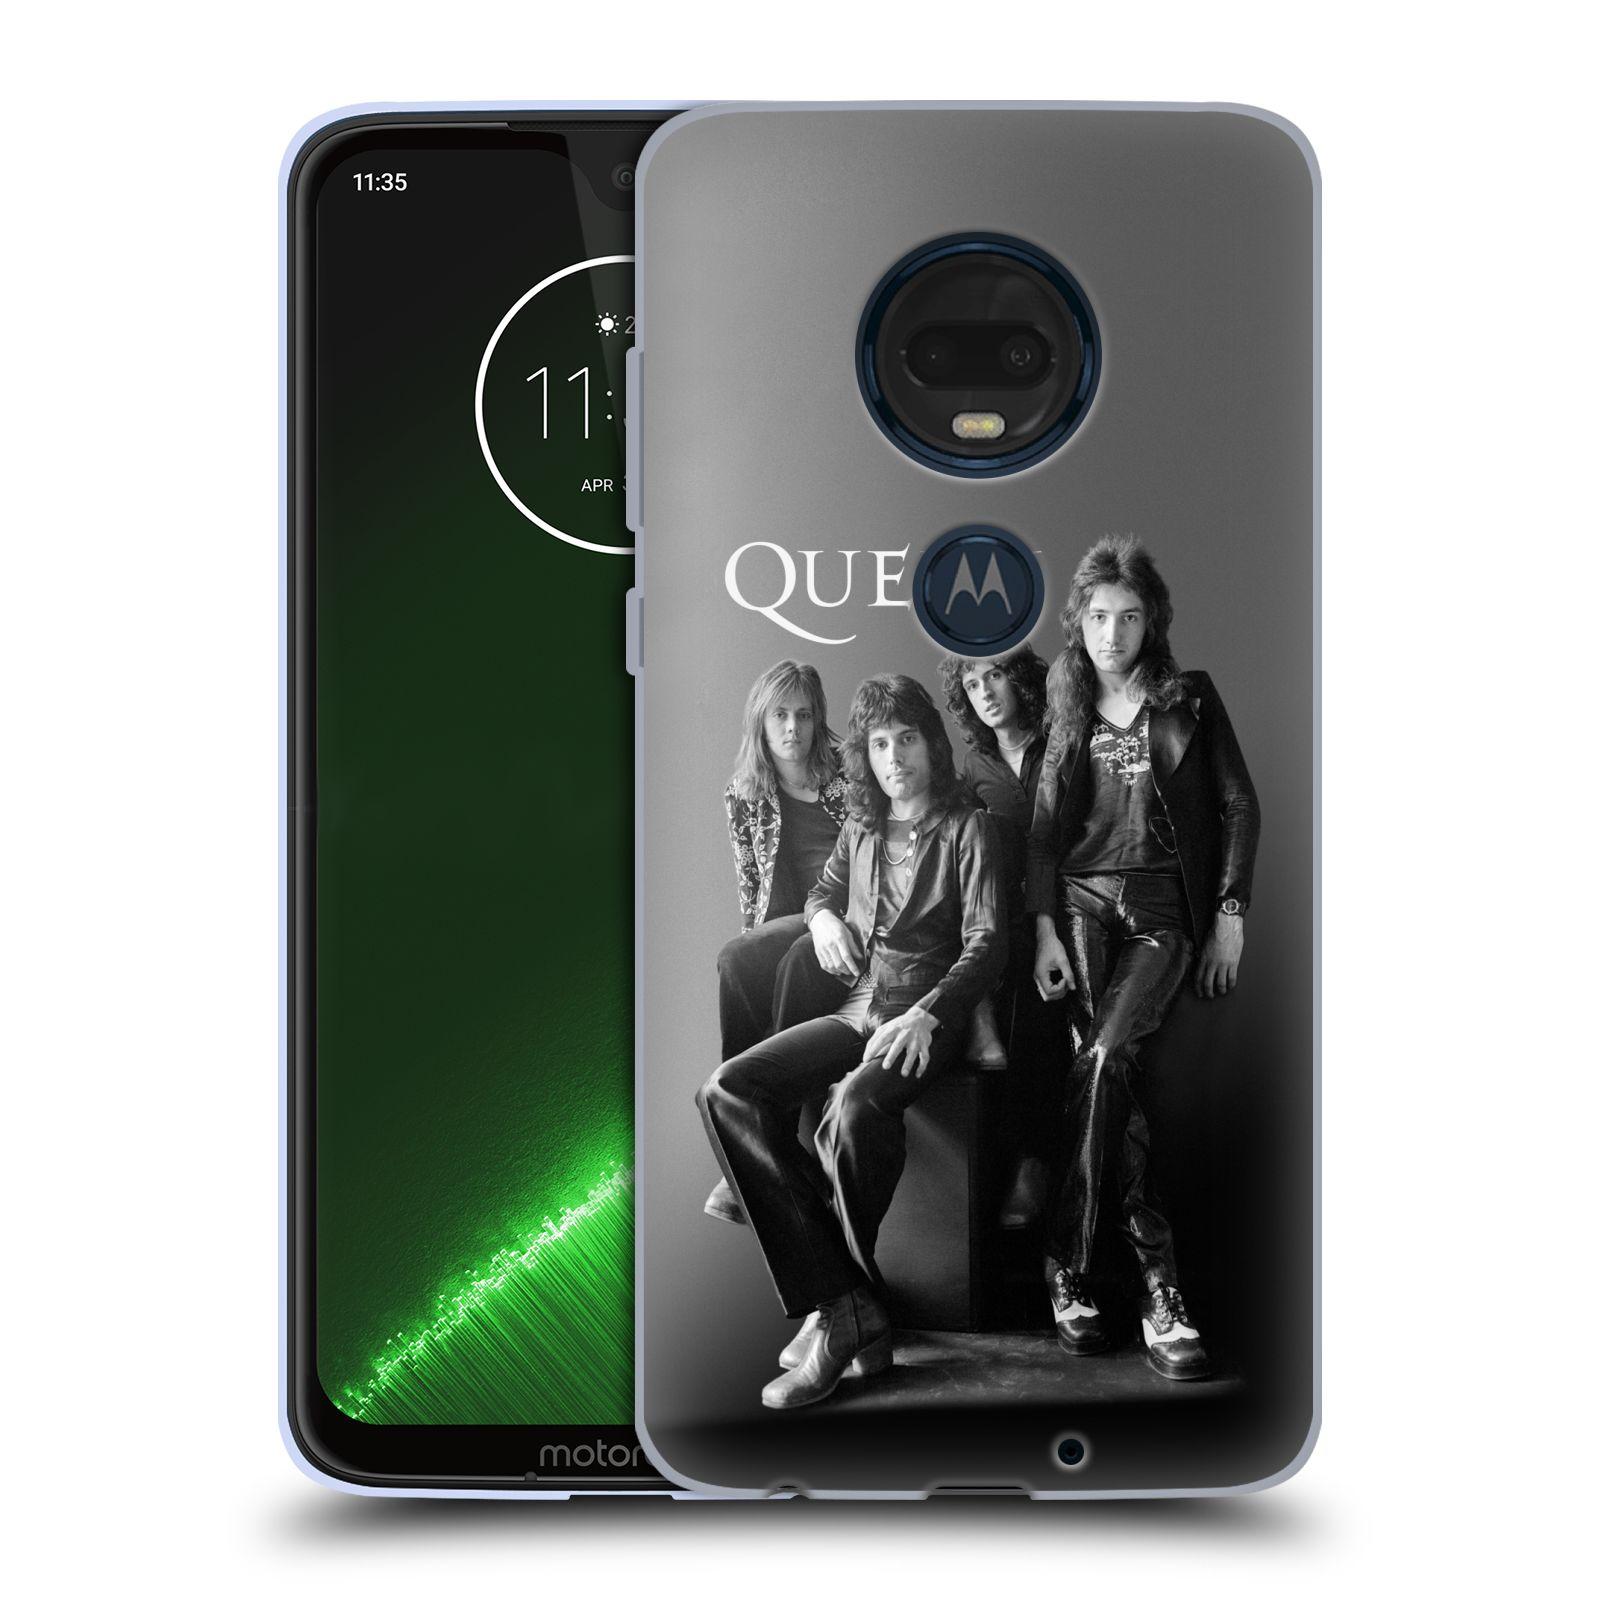 Silikonové pouzdro na mobil Motorola Moto G7 Plus - Head Case - Queen - Skupina